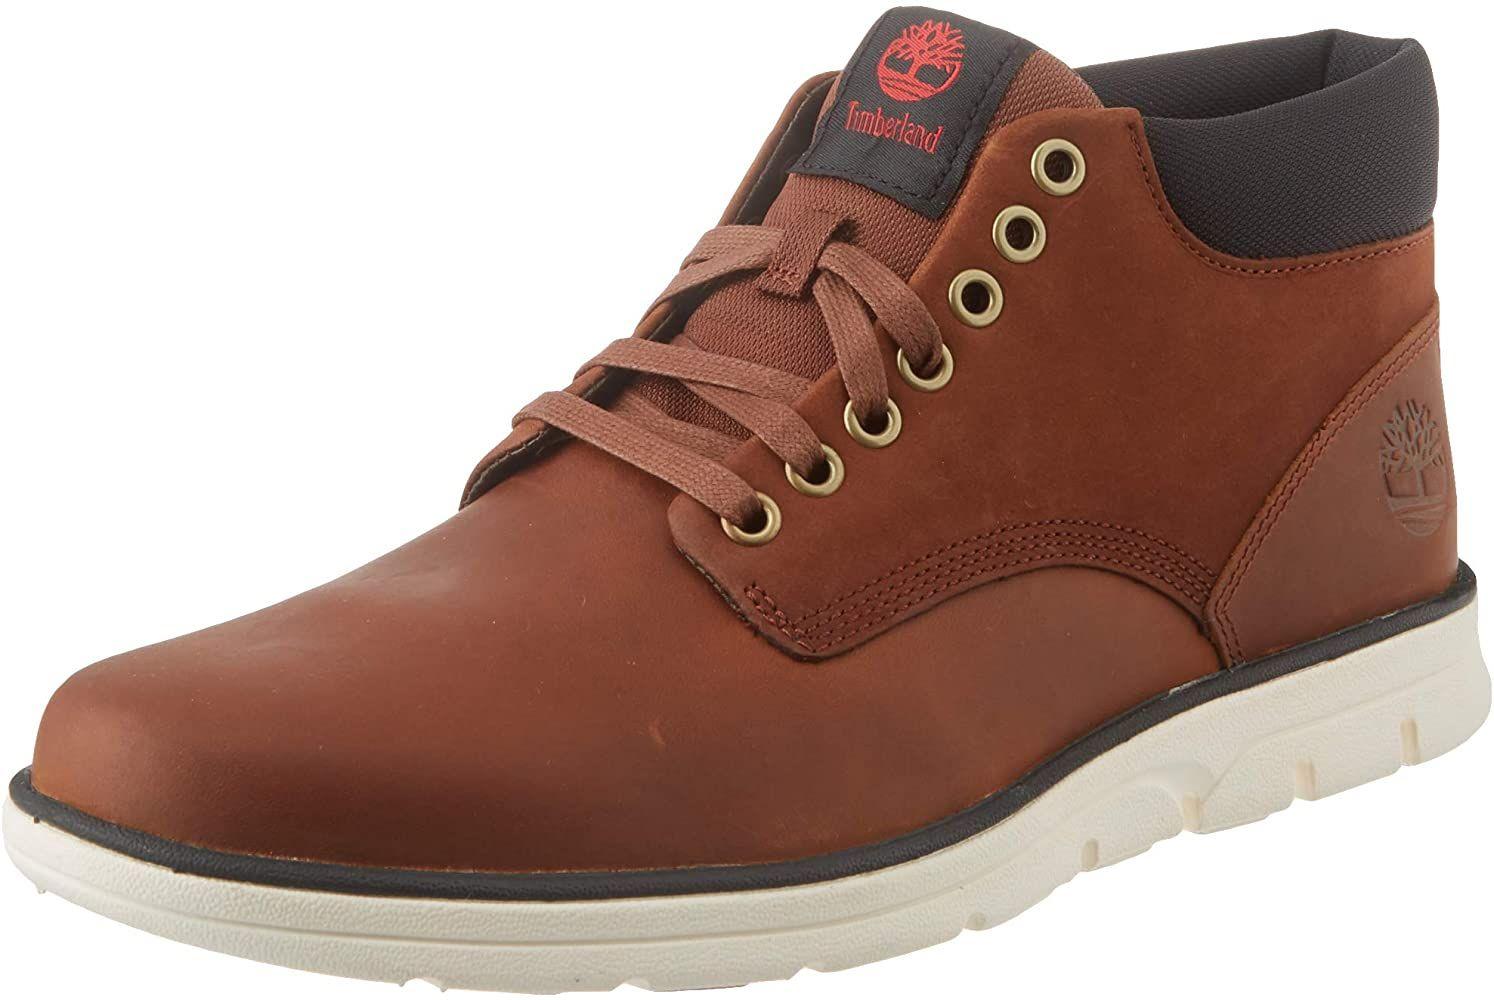 Chaussures Timberland Chukka Bradstreet - Marron